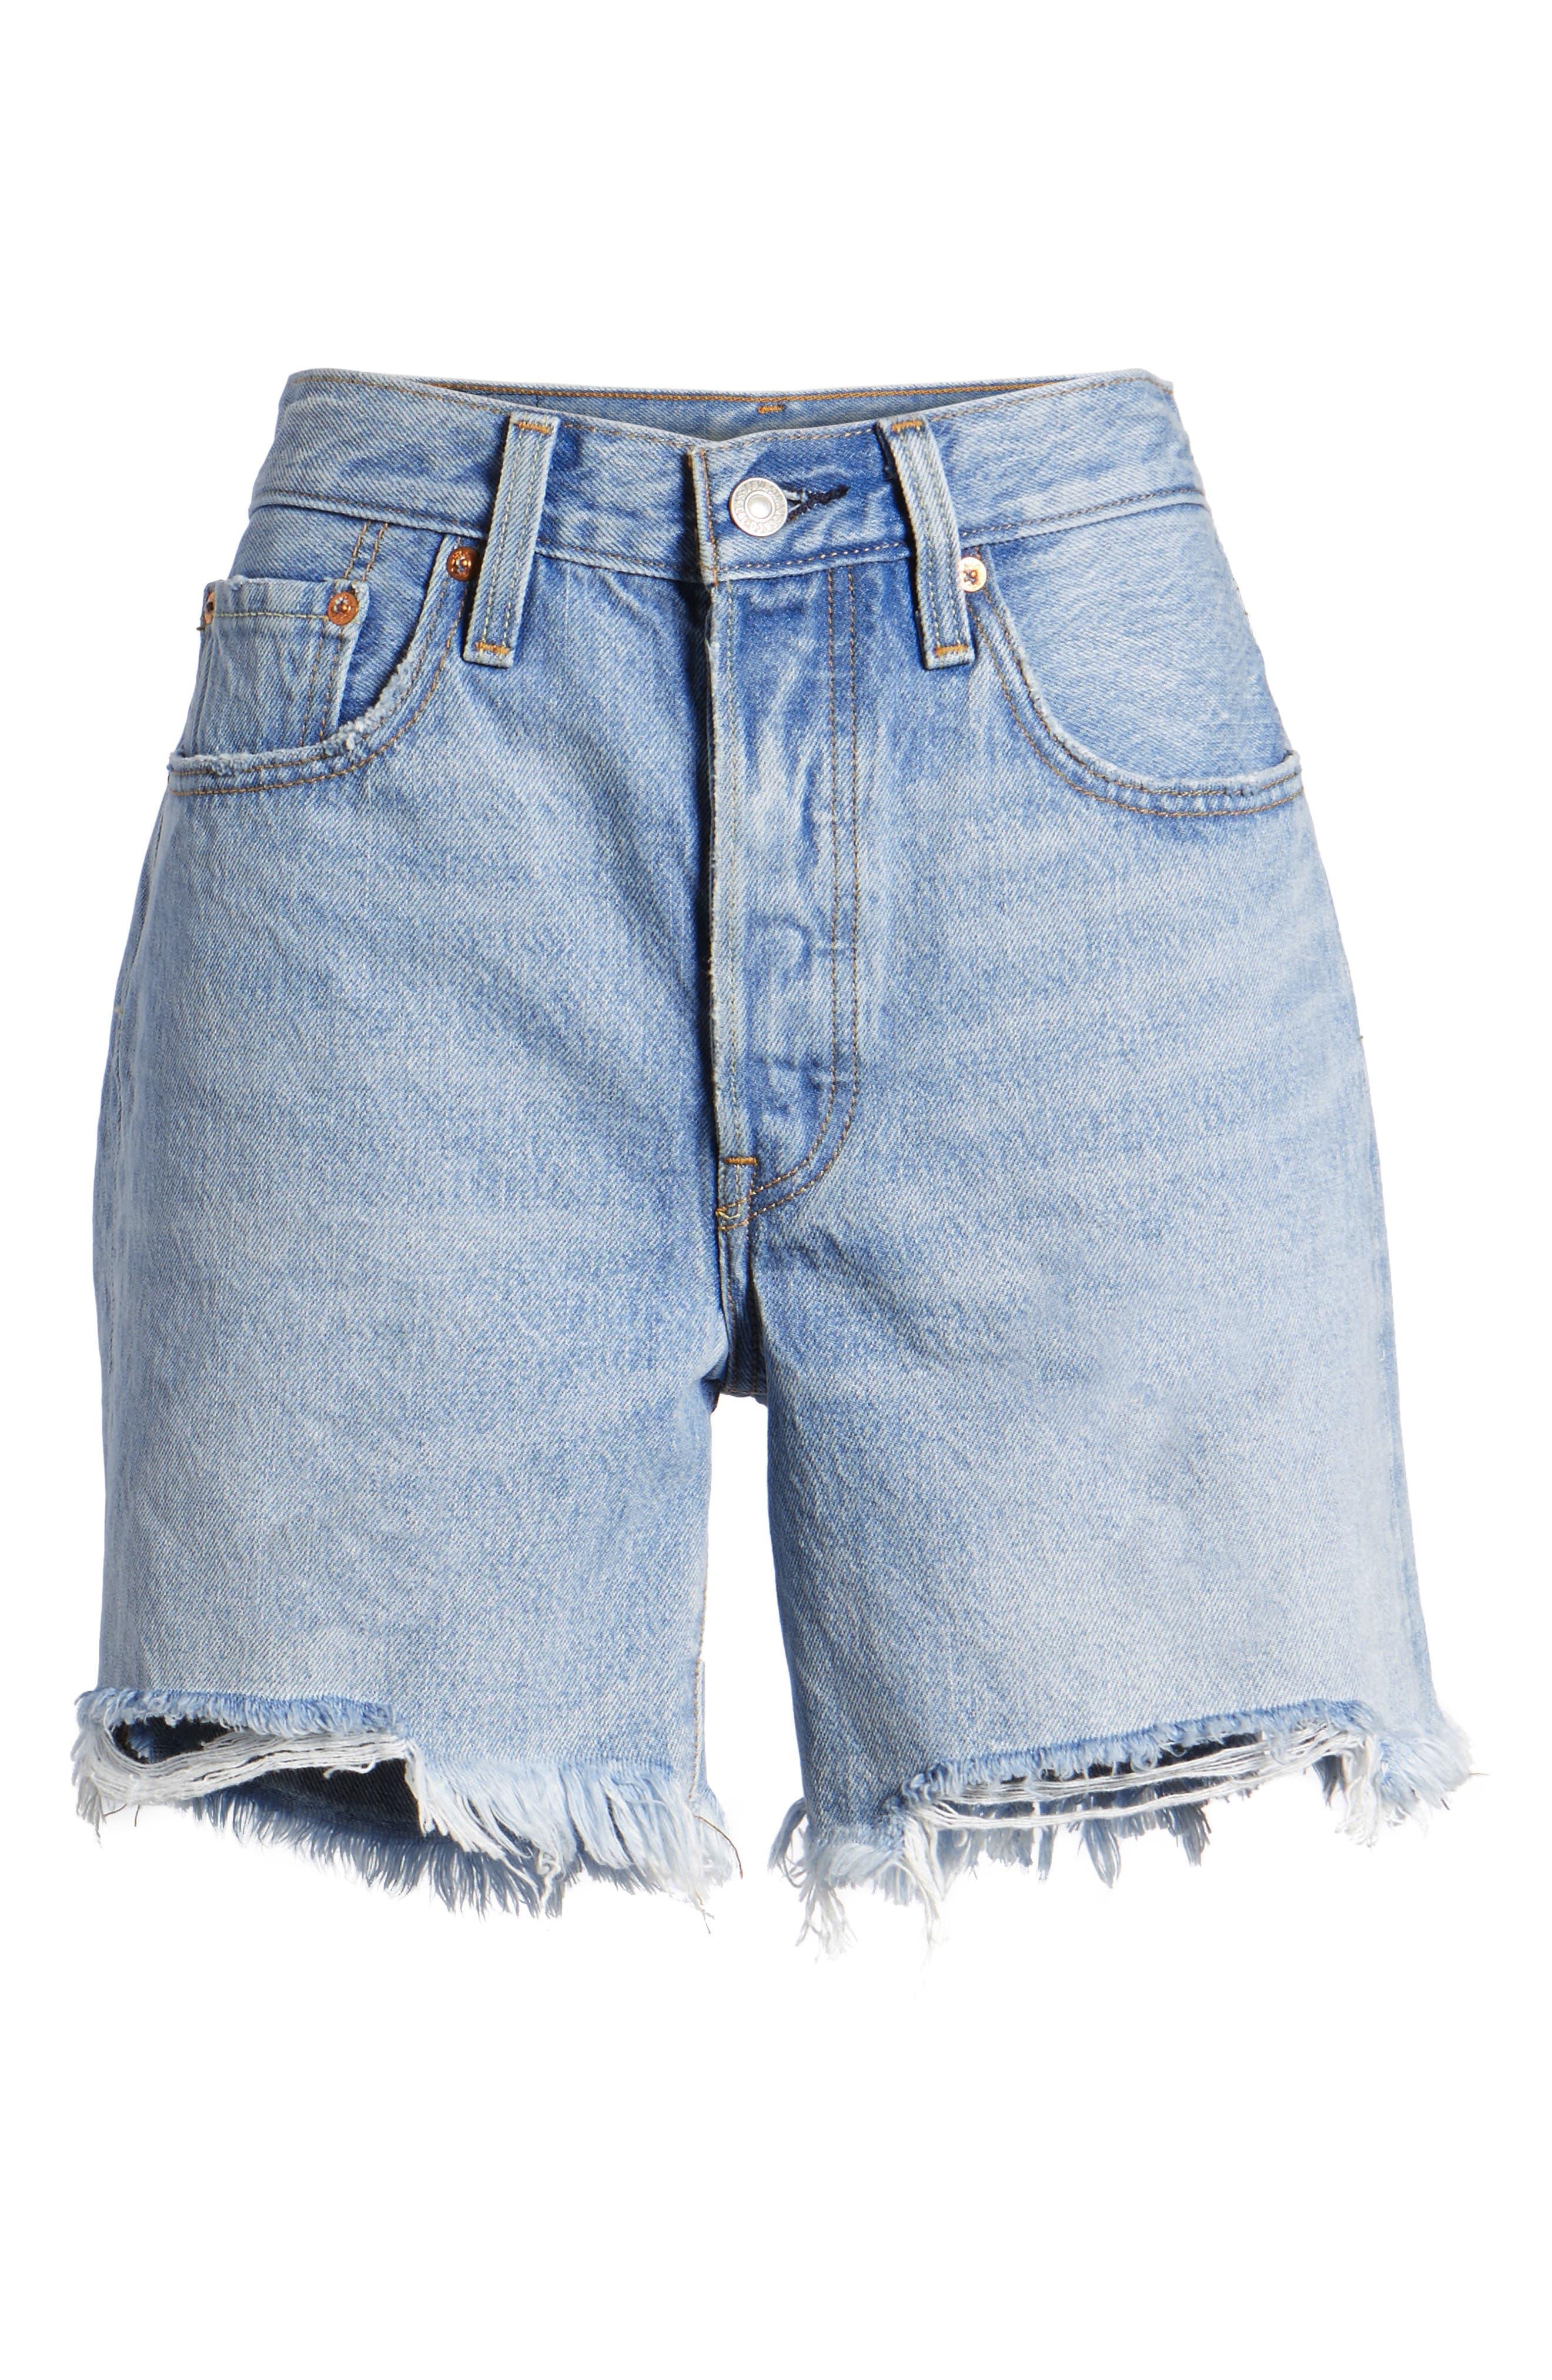 Indie Shredded Shorts,                             Alternate thumbnail 6, color,                             420